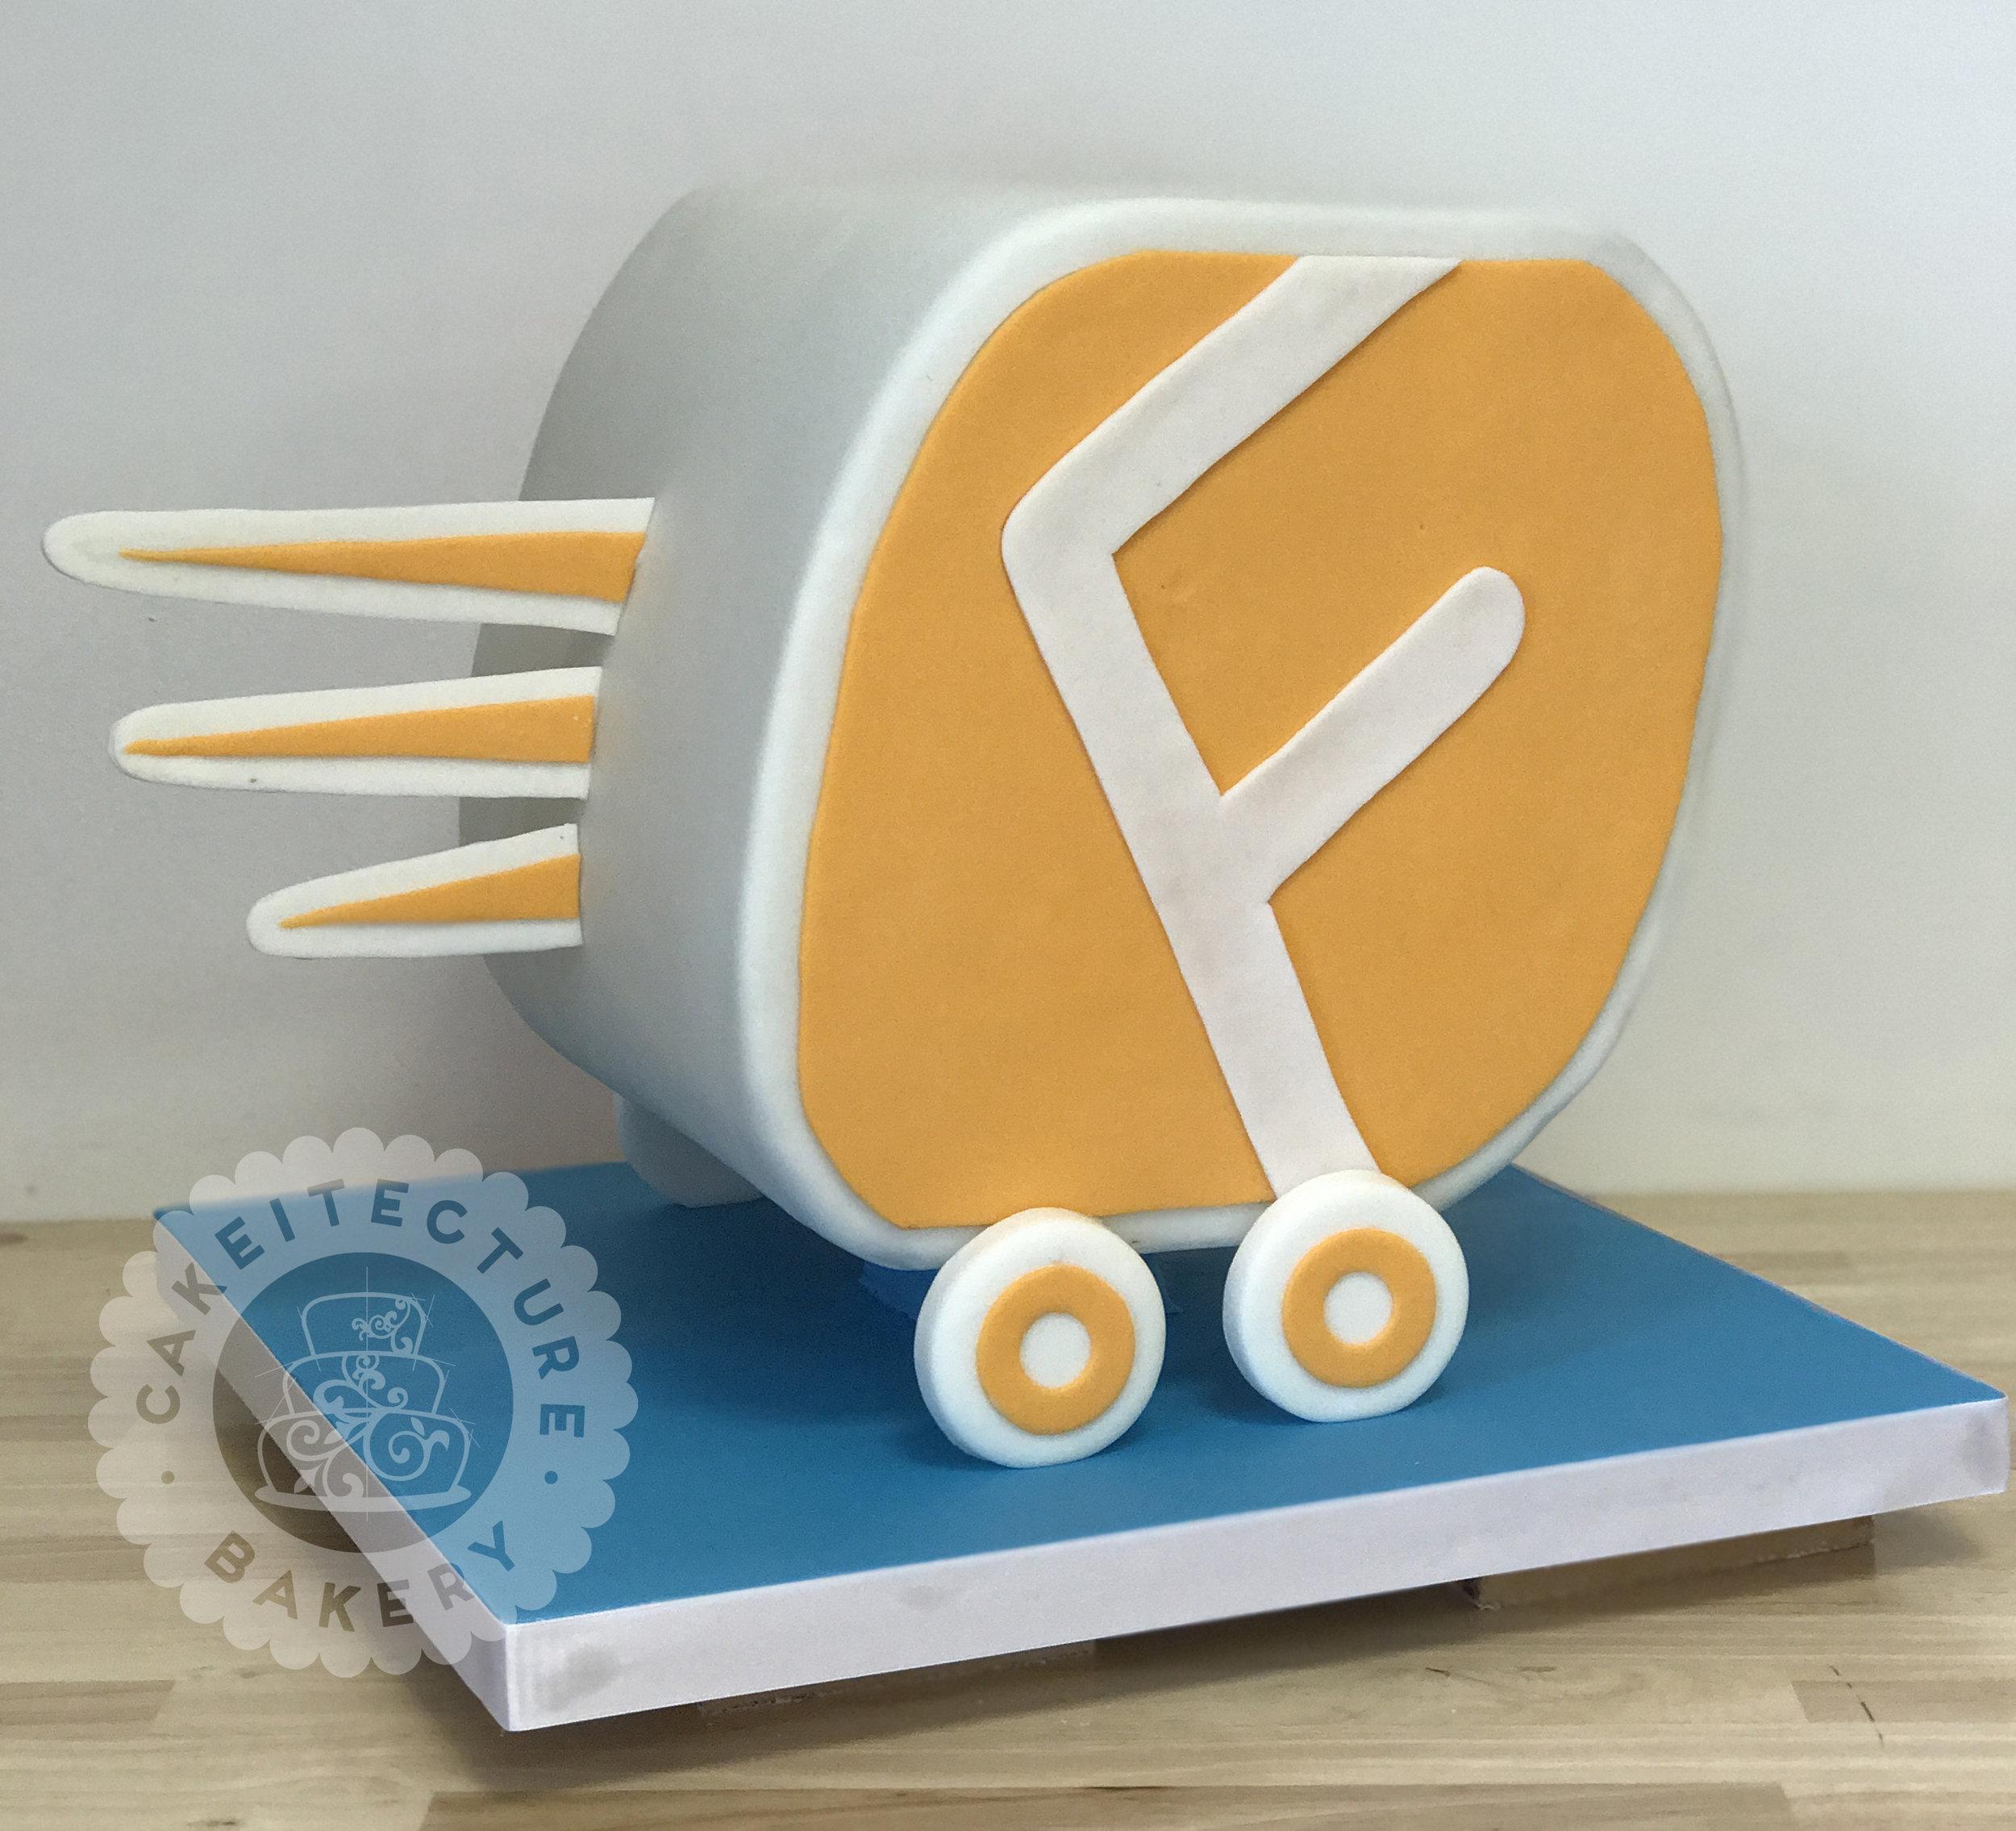 Cakeitecture Bakery 1705 fetch me logo cake.jpg